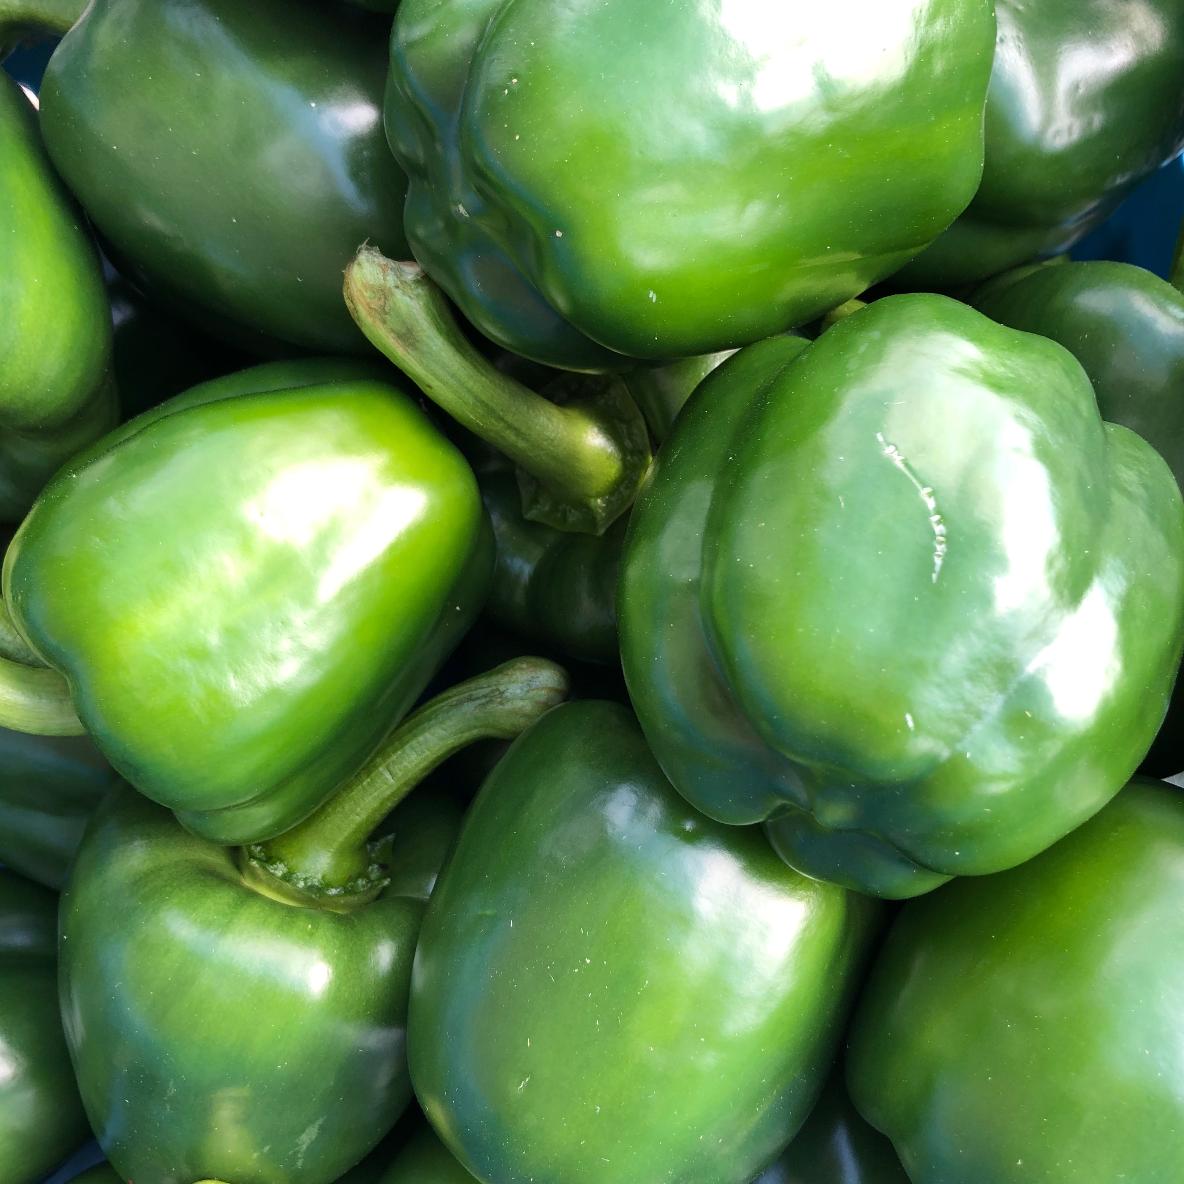 Poivrons verts 2p +/- 300g